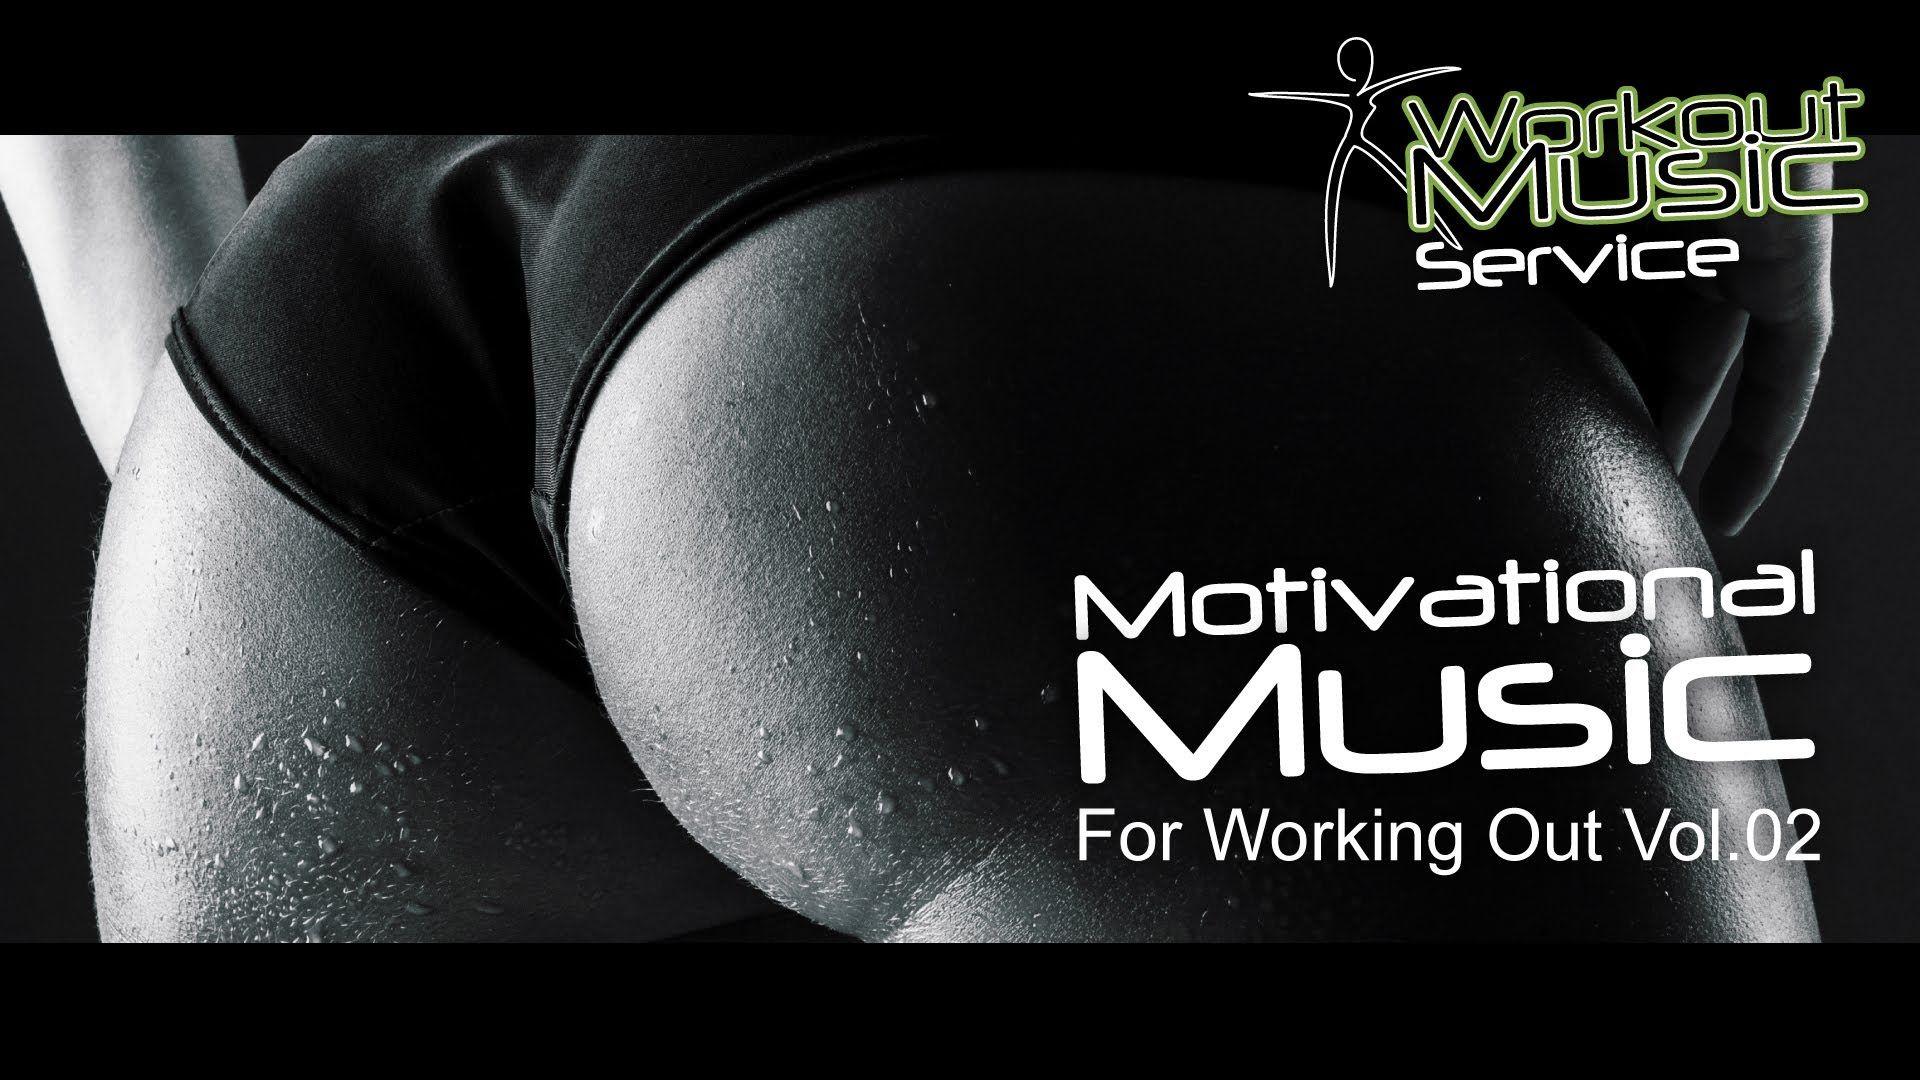 Cool Wallpaper Music Motivation - 9672b775d1e6287ac26bf79a9ac47488  Image_505793.jpg